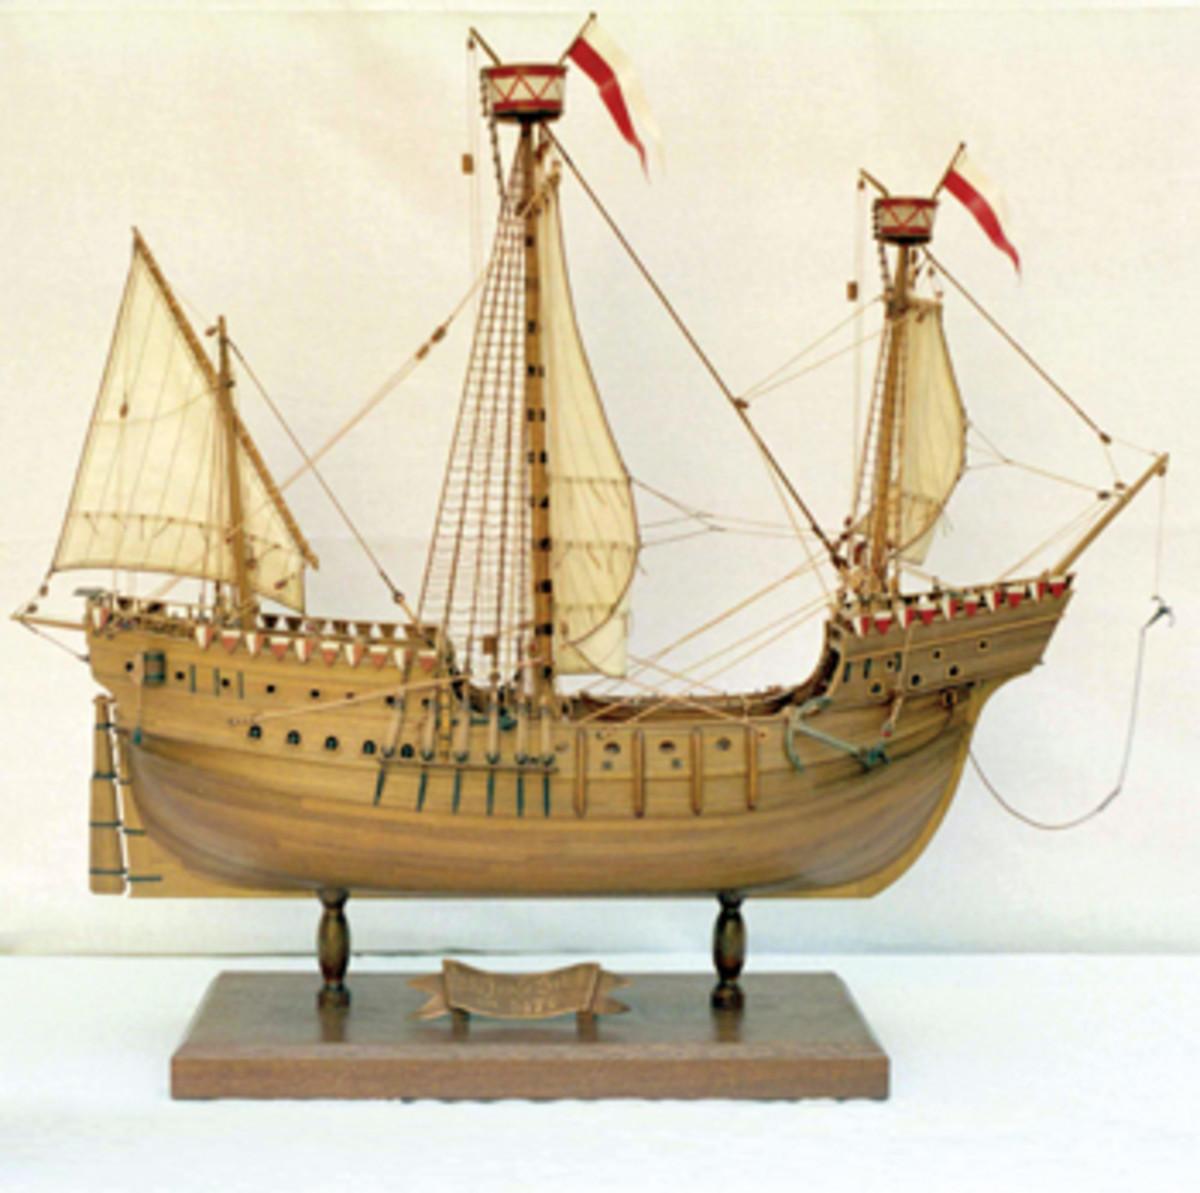 The Hanneke Wrome's cargo included 10,000 gold guilders when it sank in 1468.